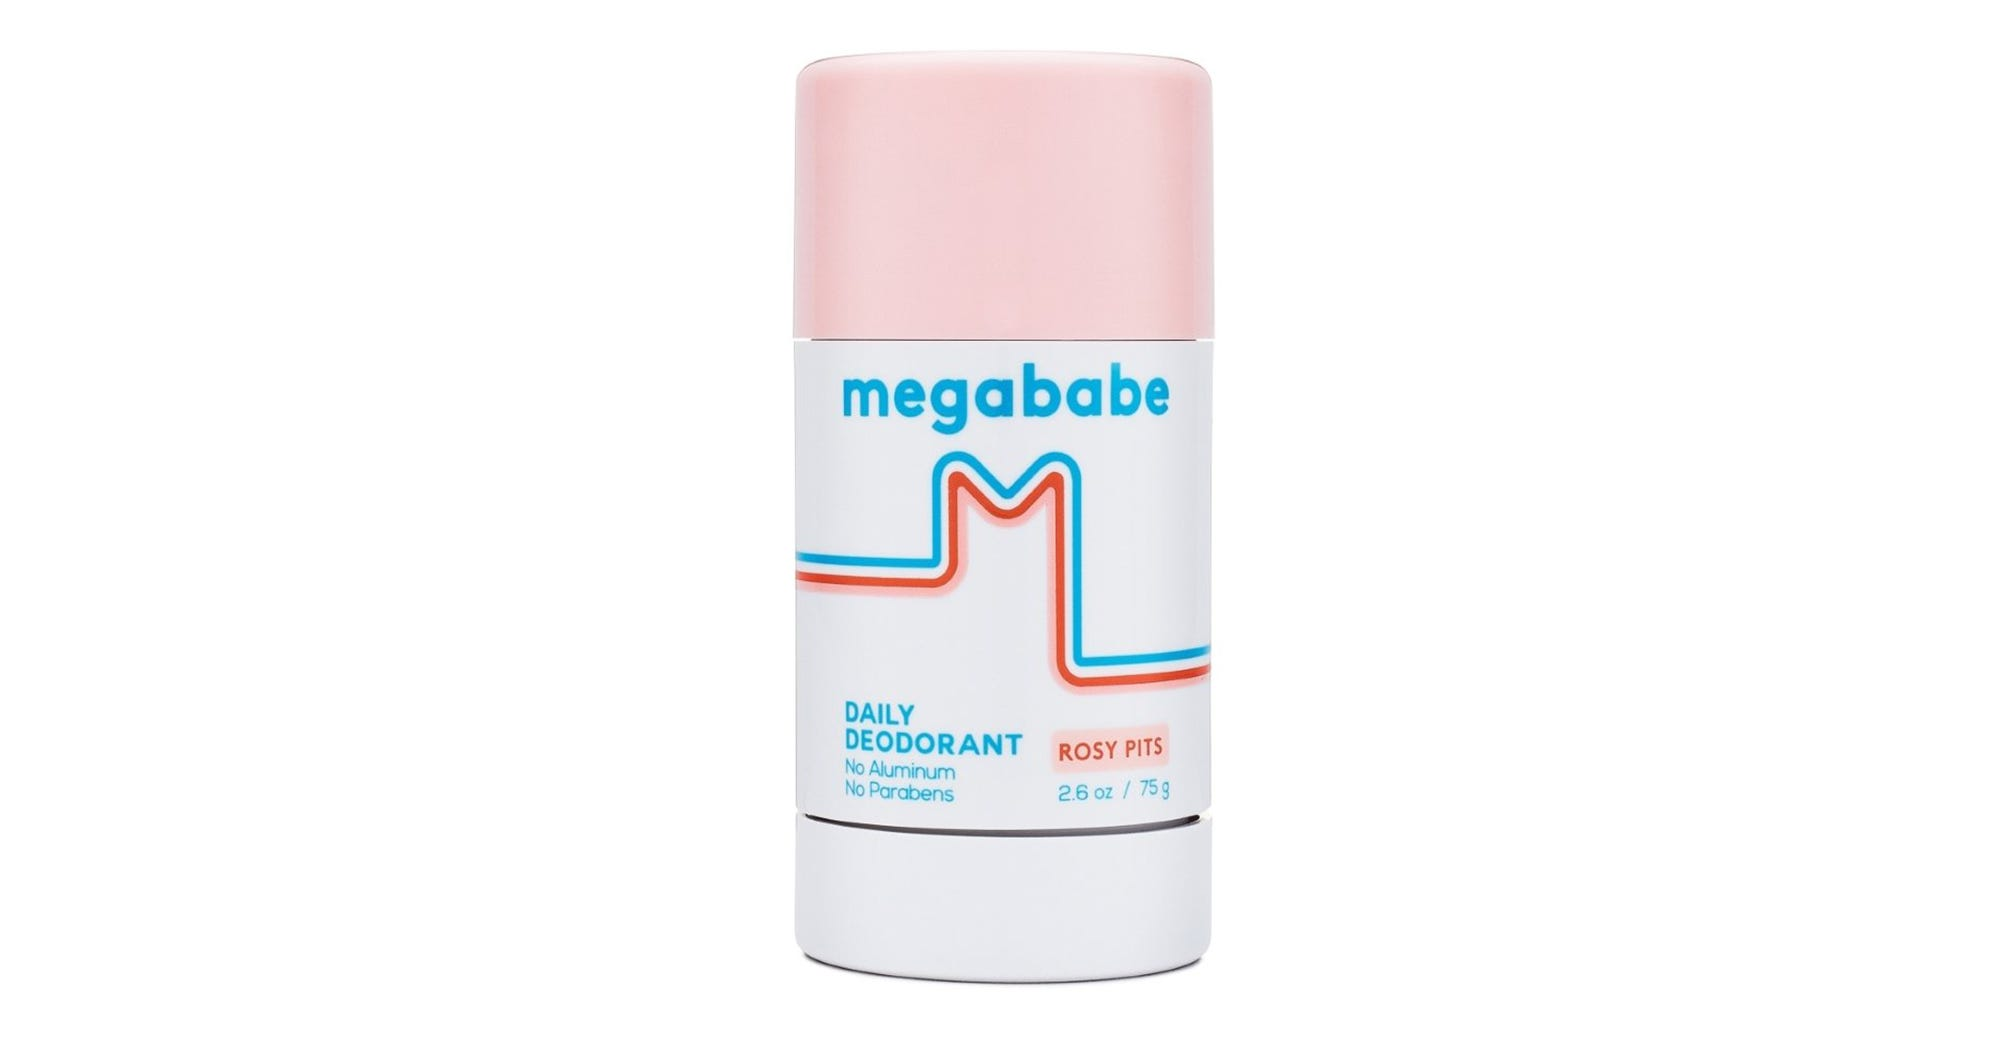 Best Natural Deodorant & Organic Brands That Work 2019